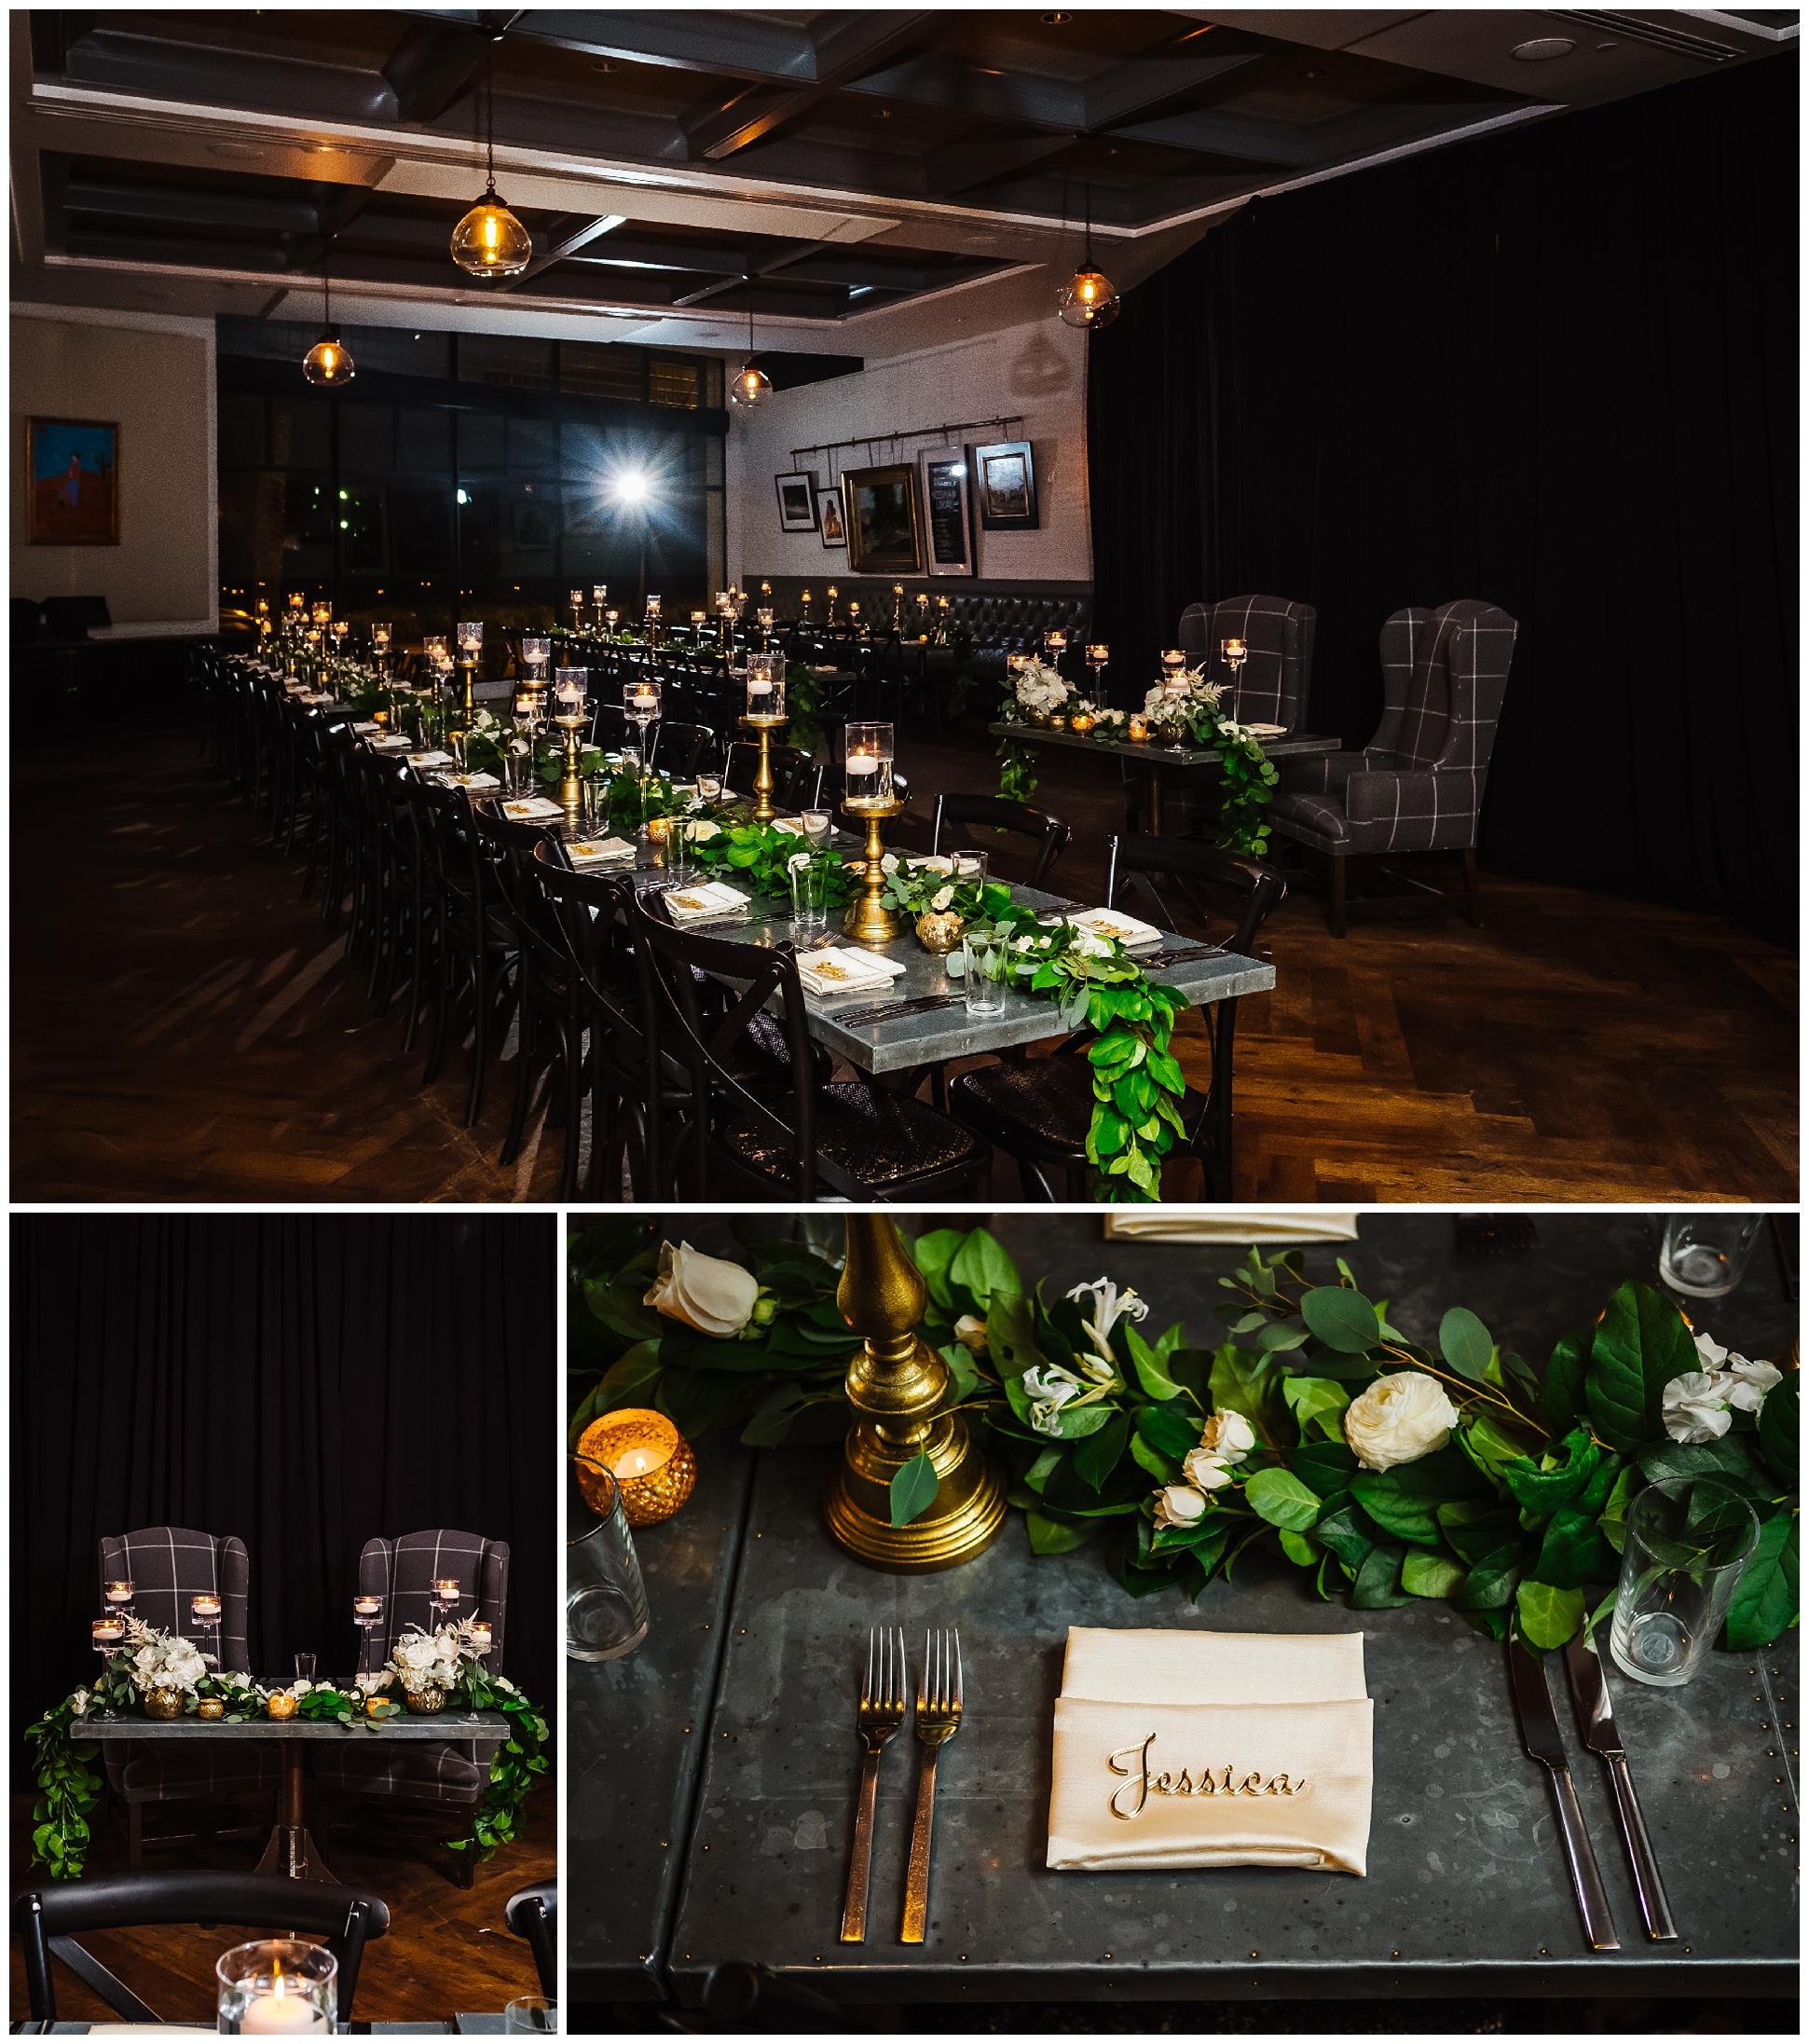 tampa-wedding-photographer-oxford-exchange-garland-candlelight-gold-hayley-paige_0049.jpg